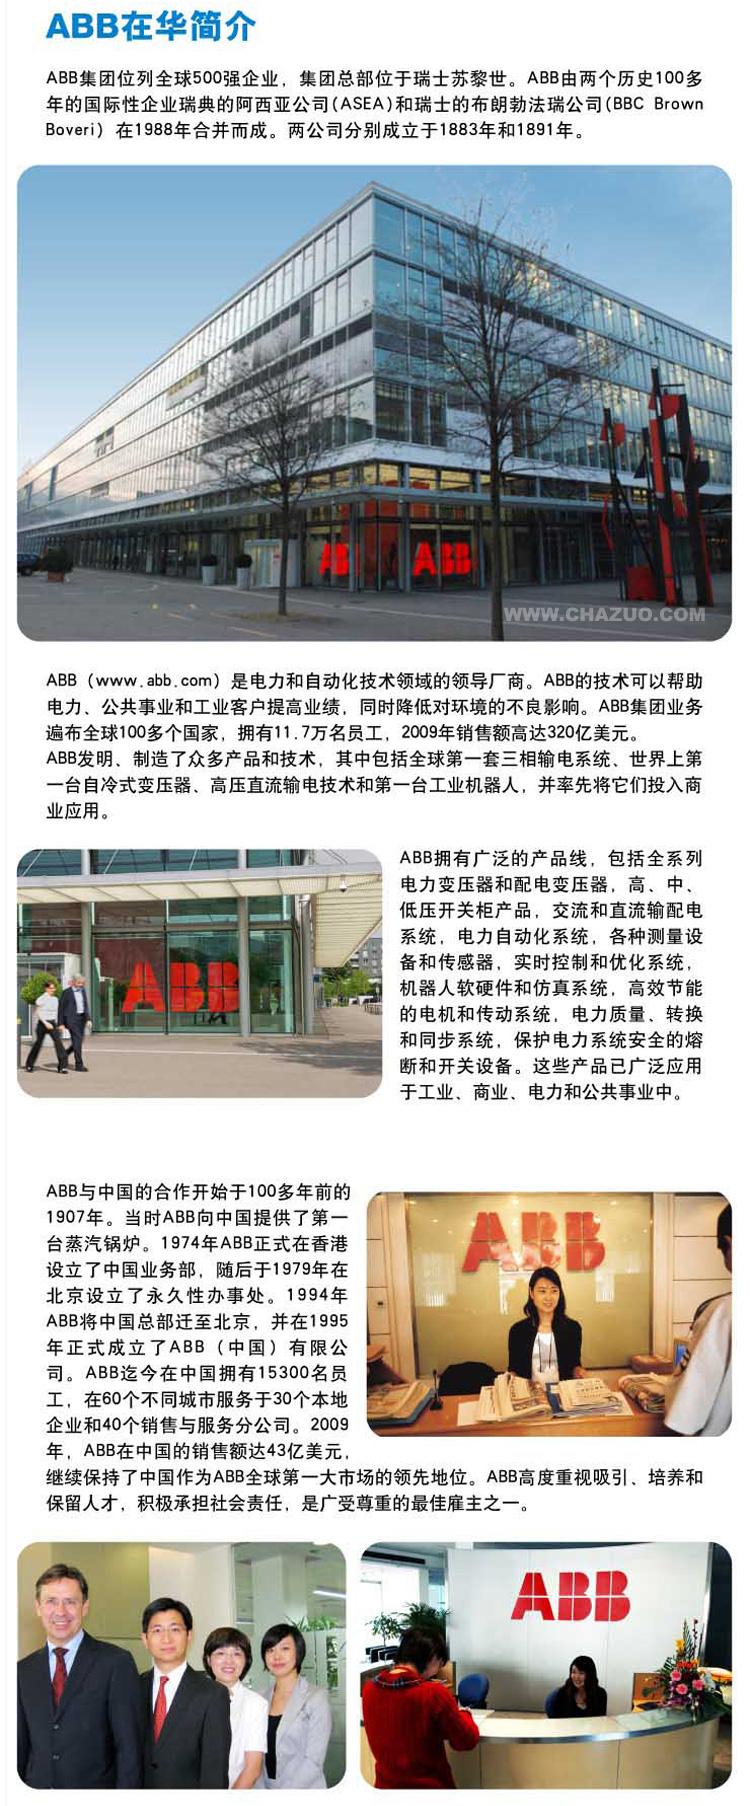 ABB公司简介